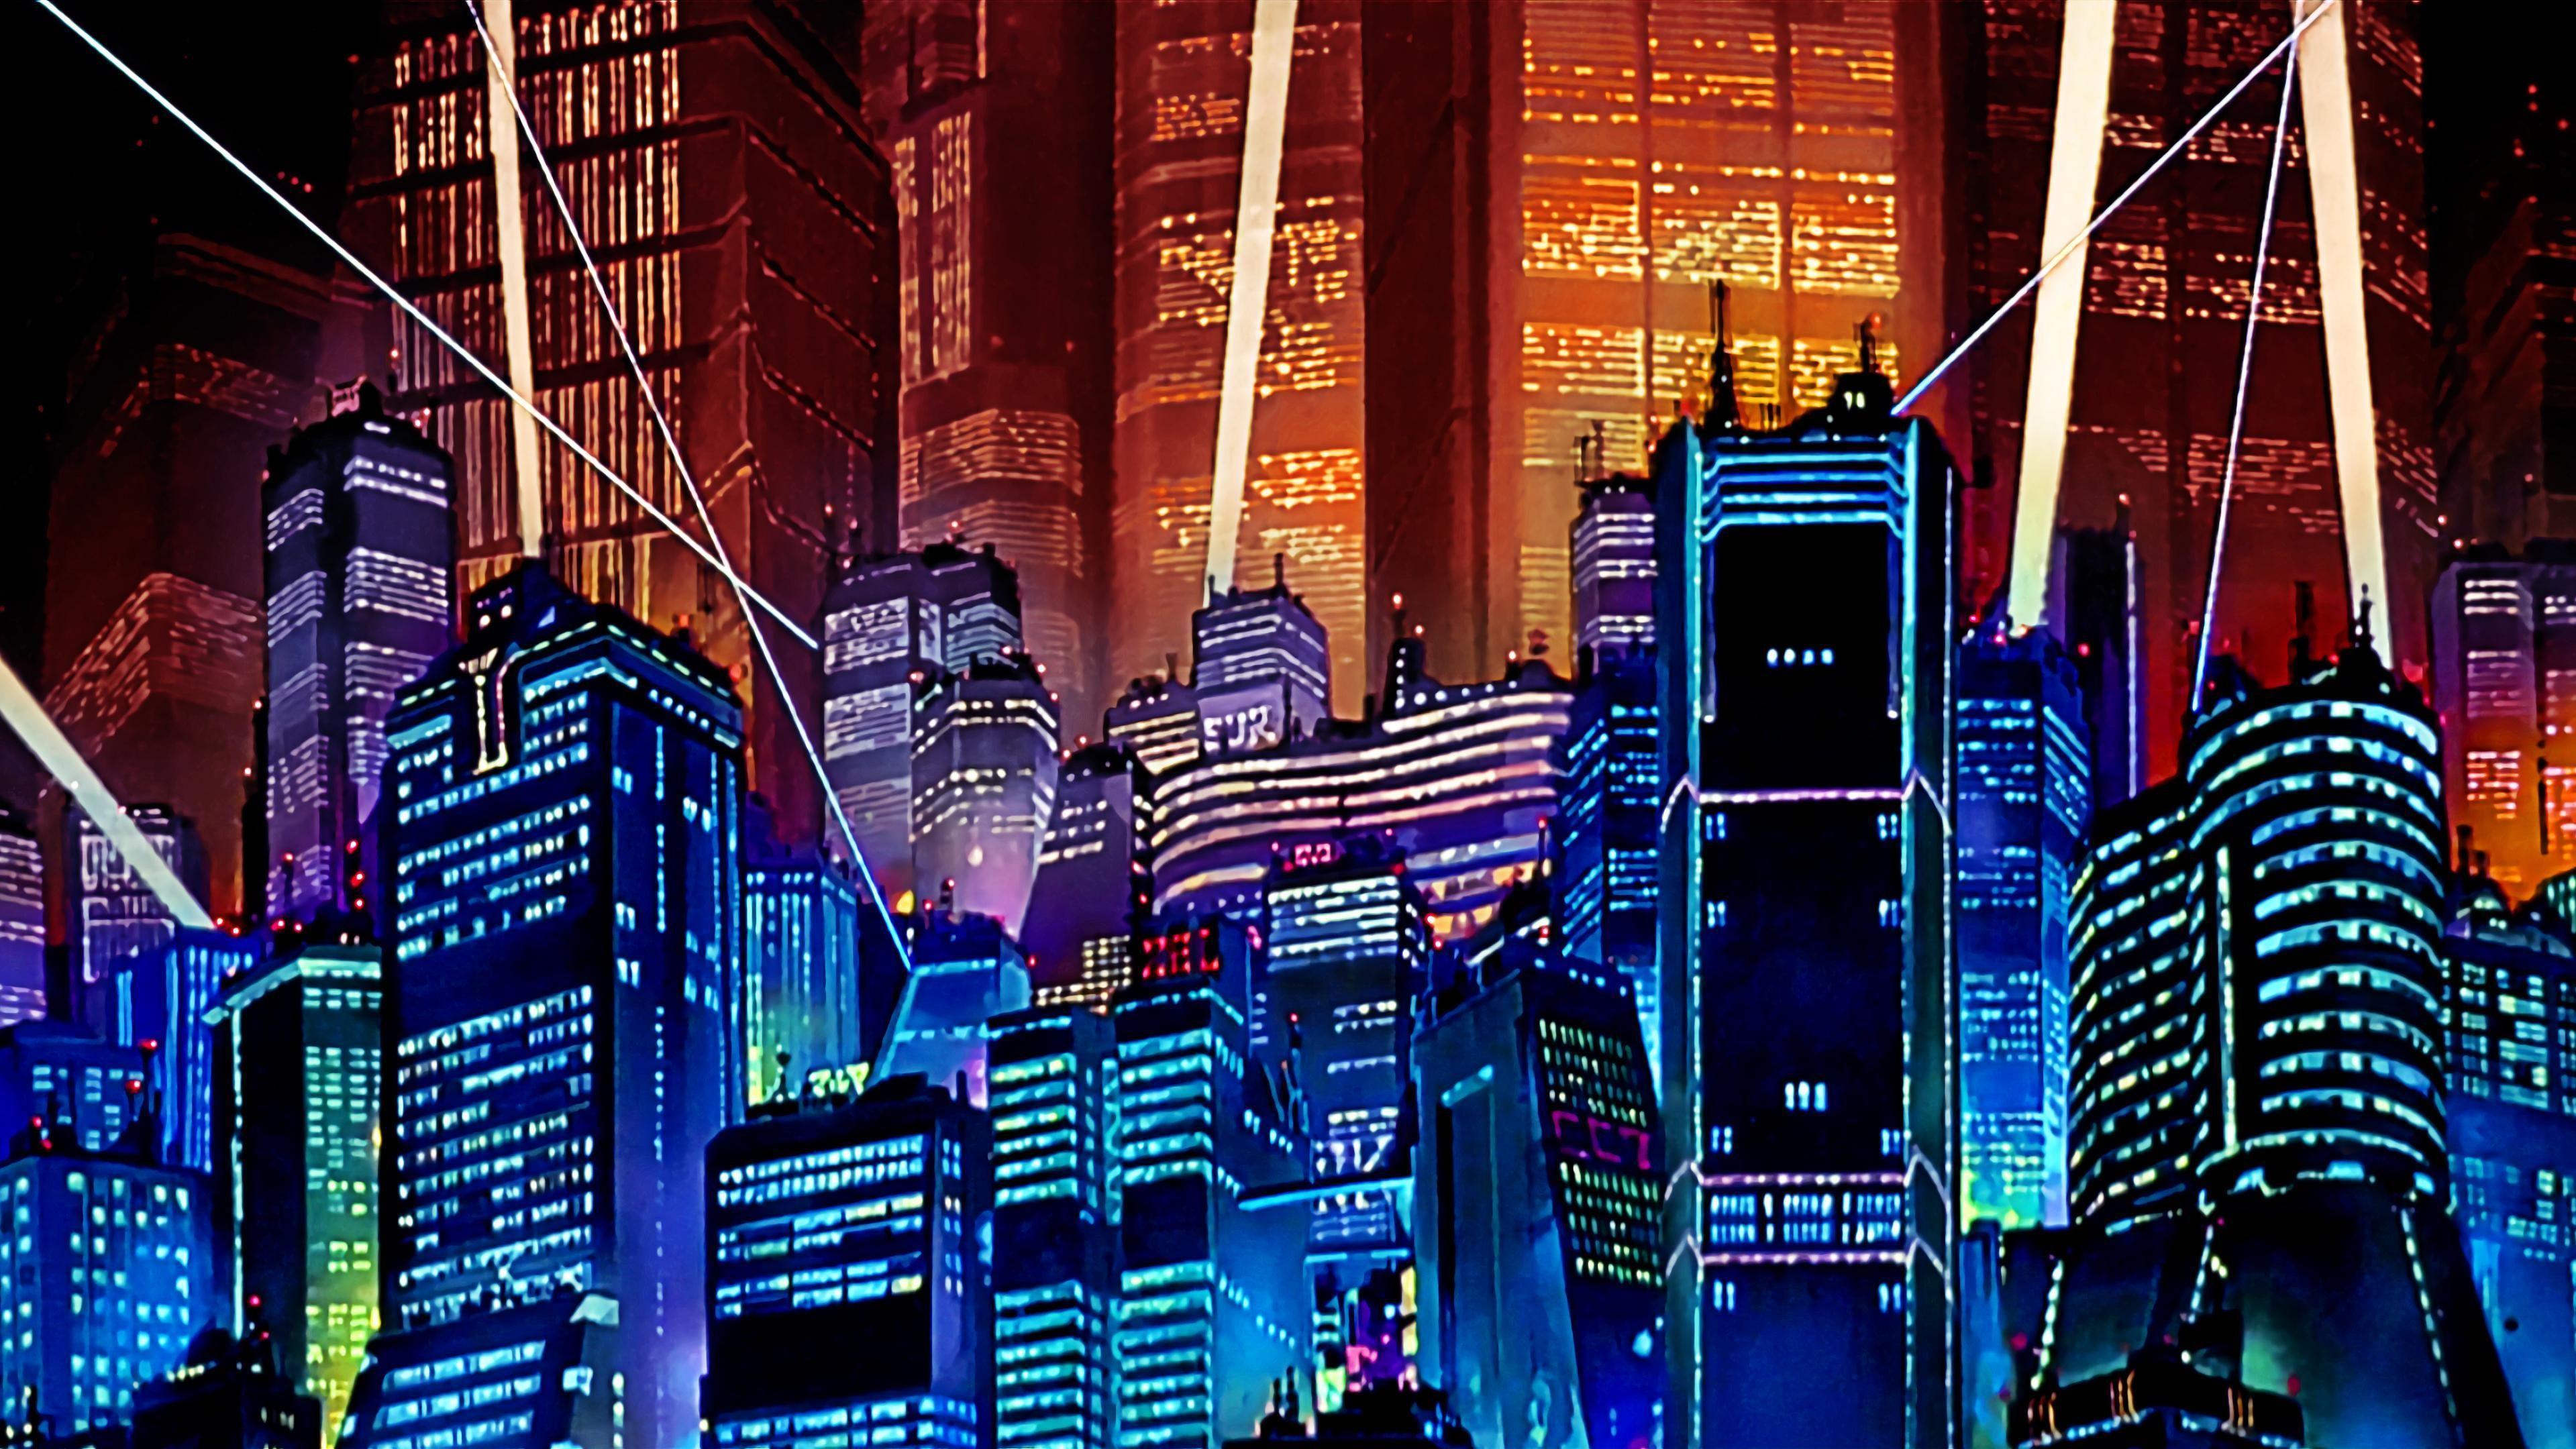 Akira Neo Tokyo Wallpapers Top Free Akira Neo Tokyo Backgrounds Wallpaperaccess